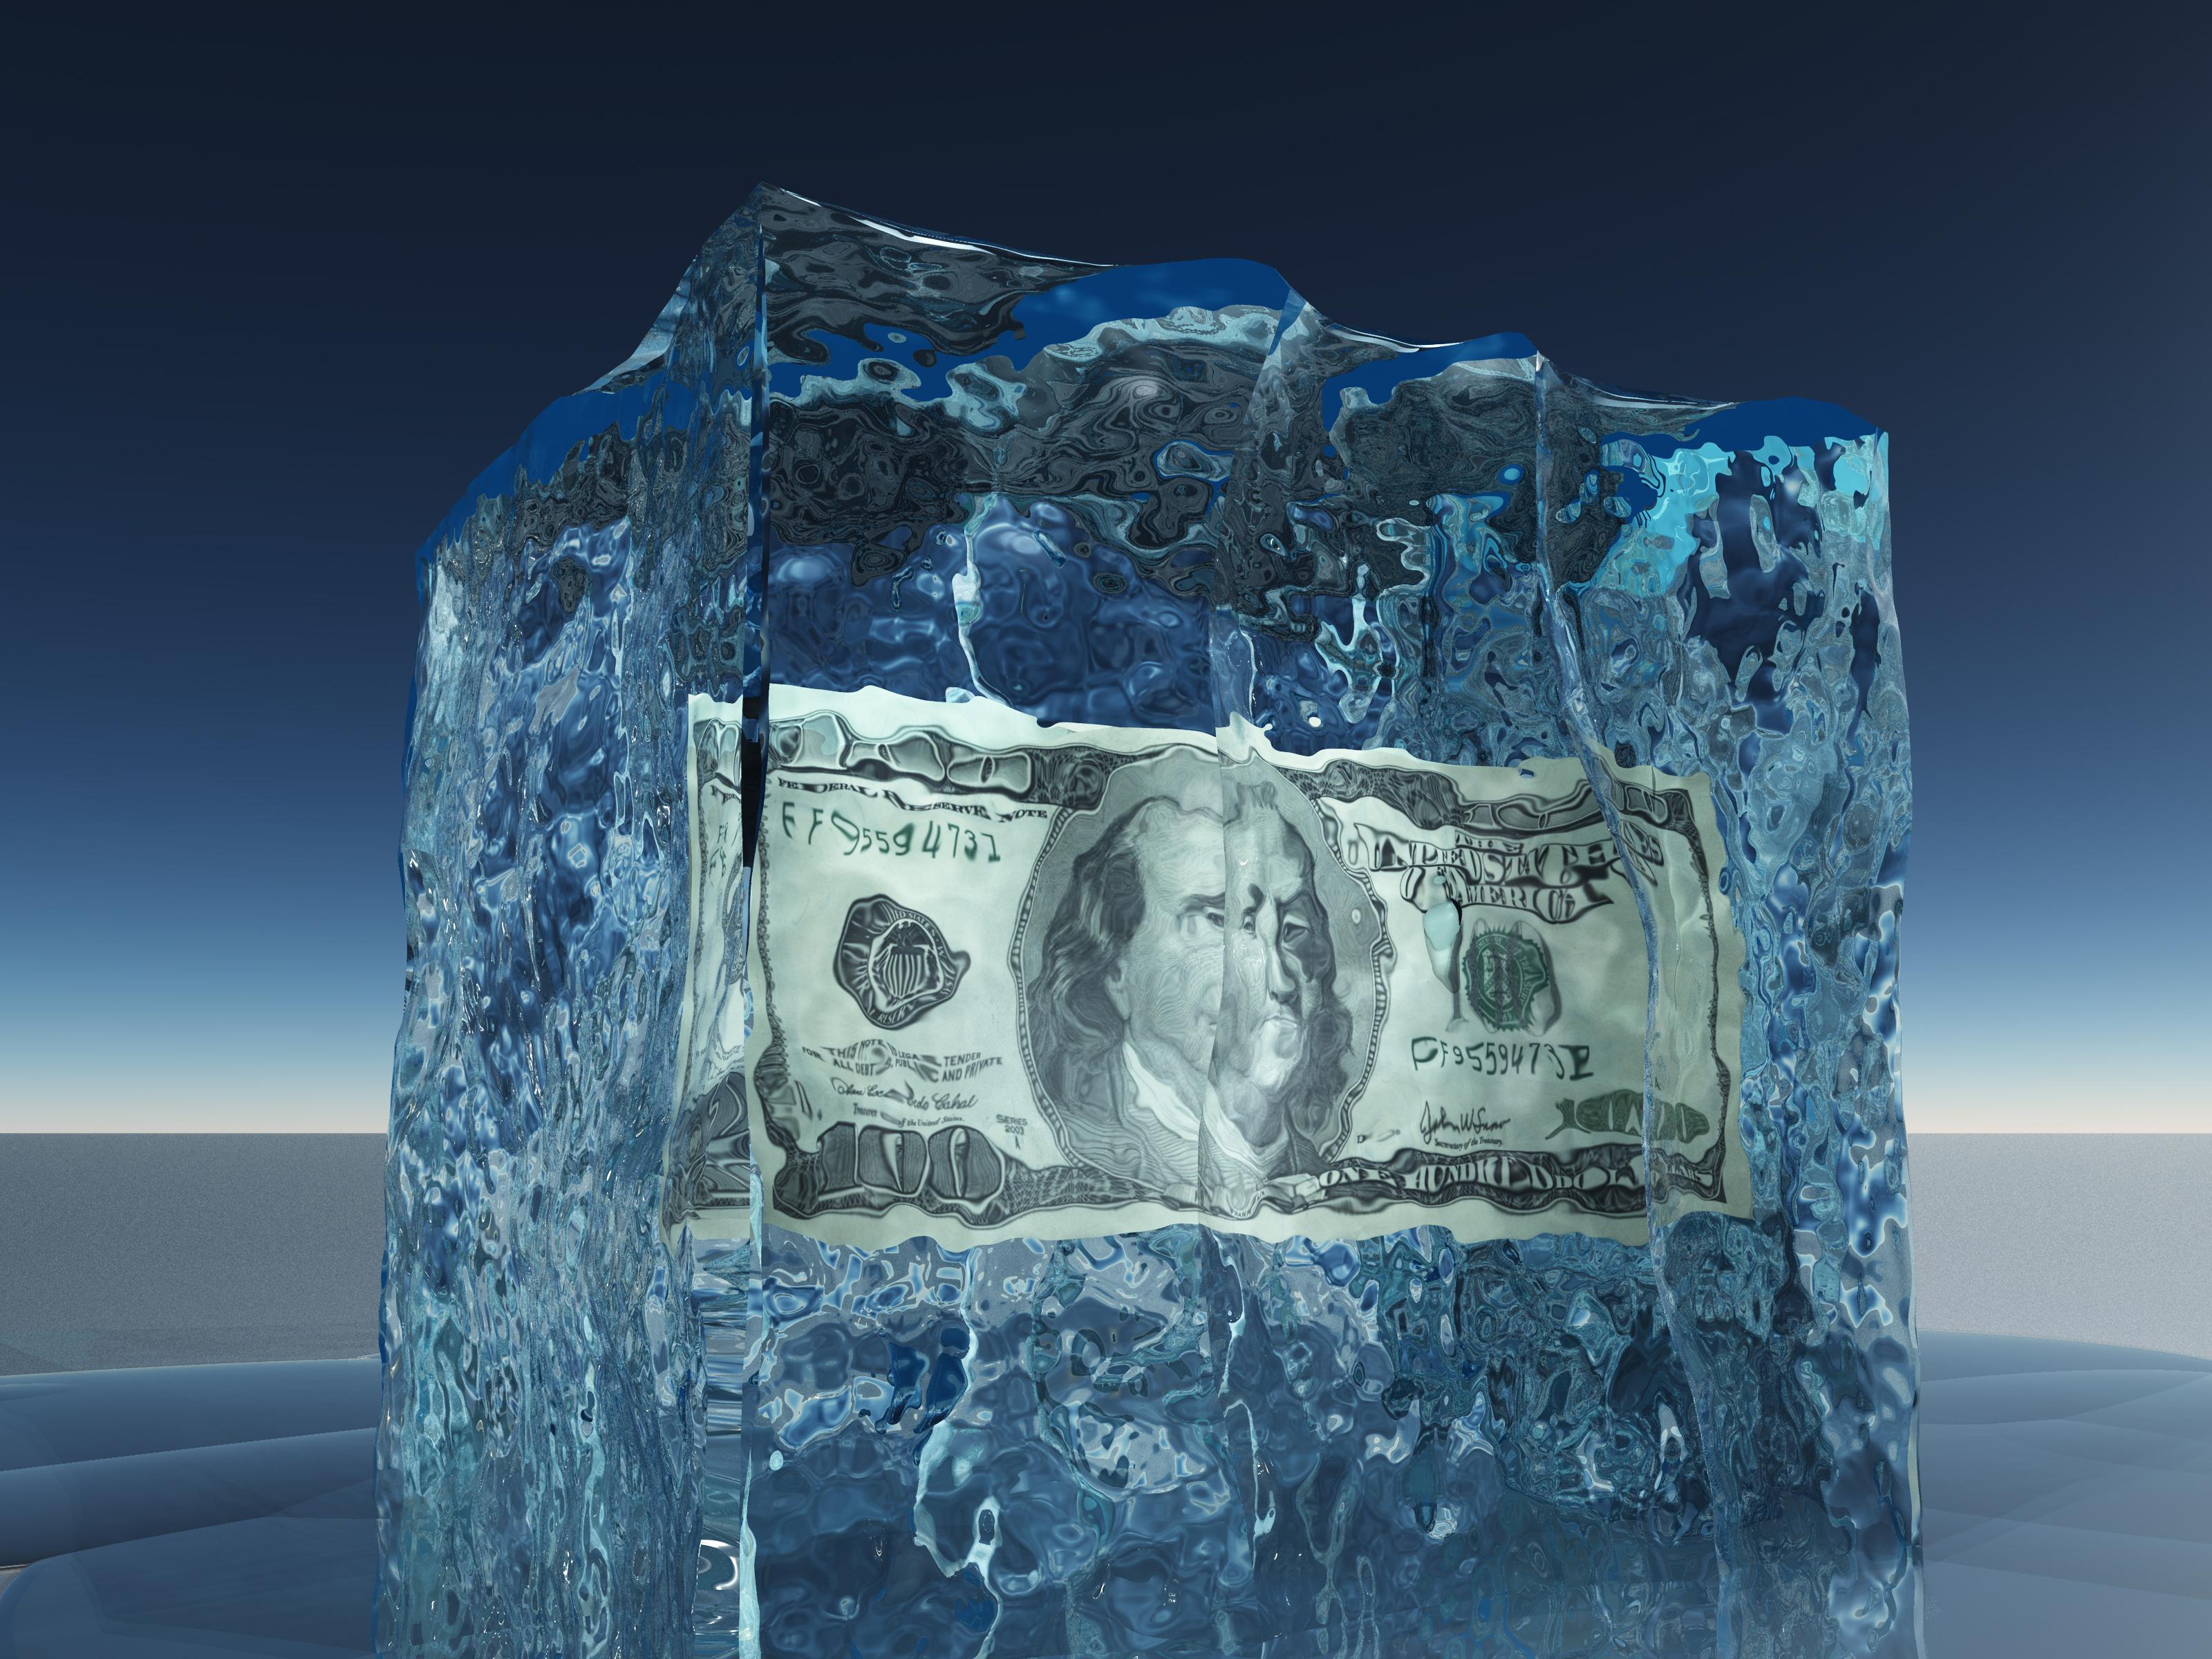 Getty Money in Ice Block